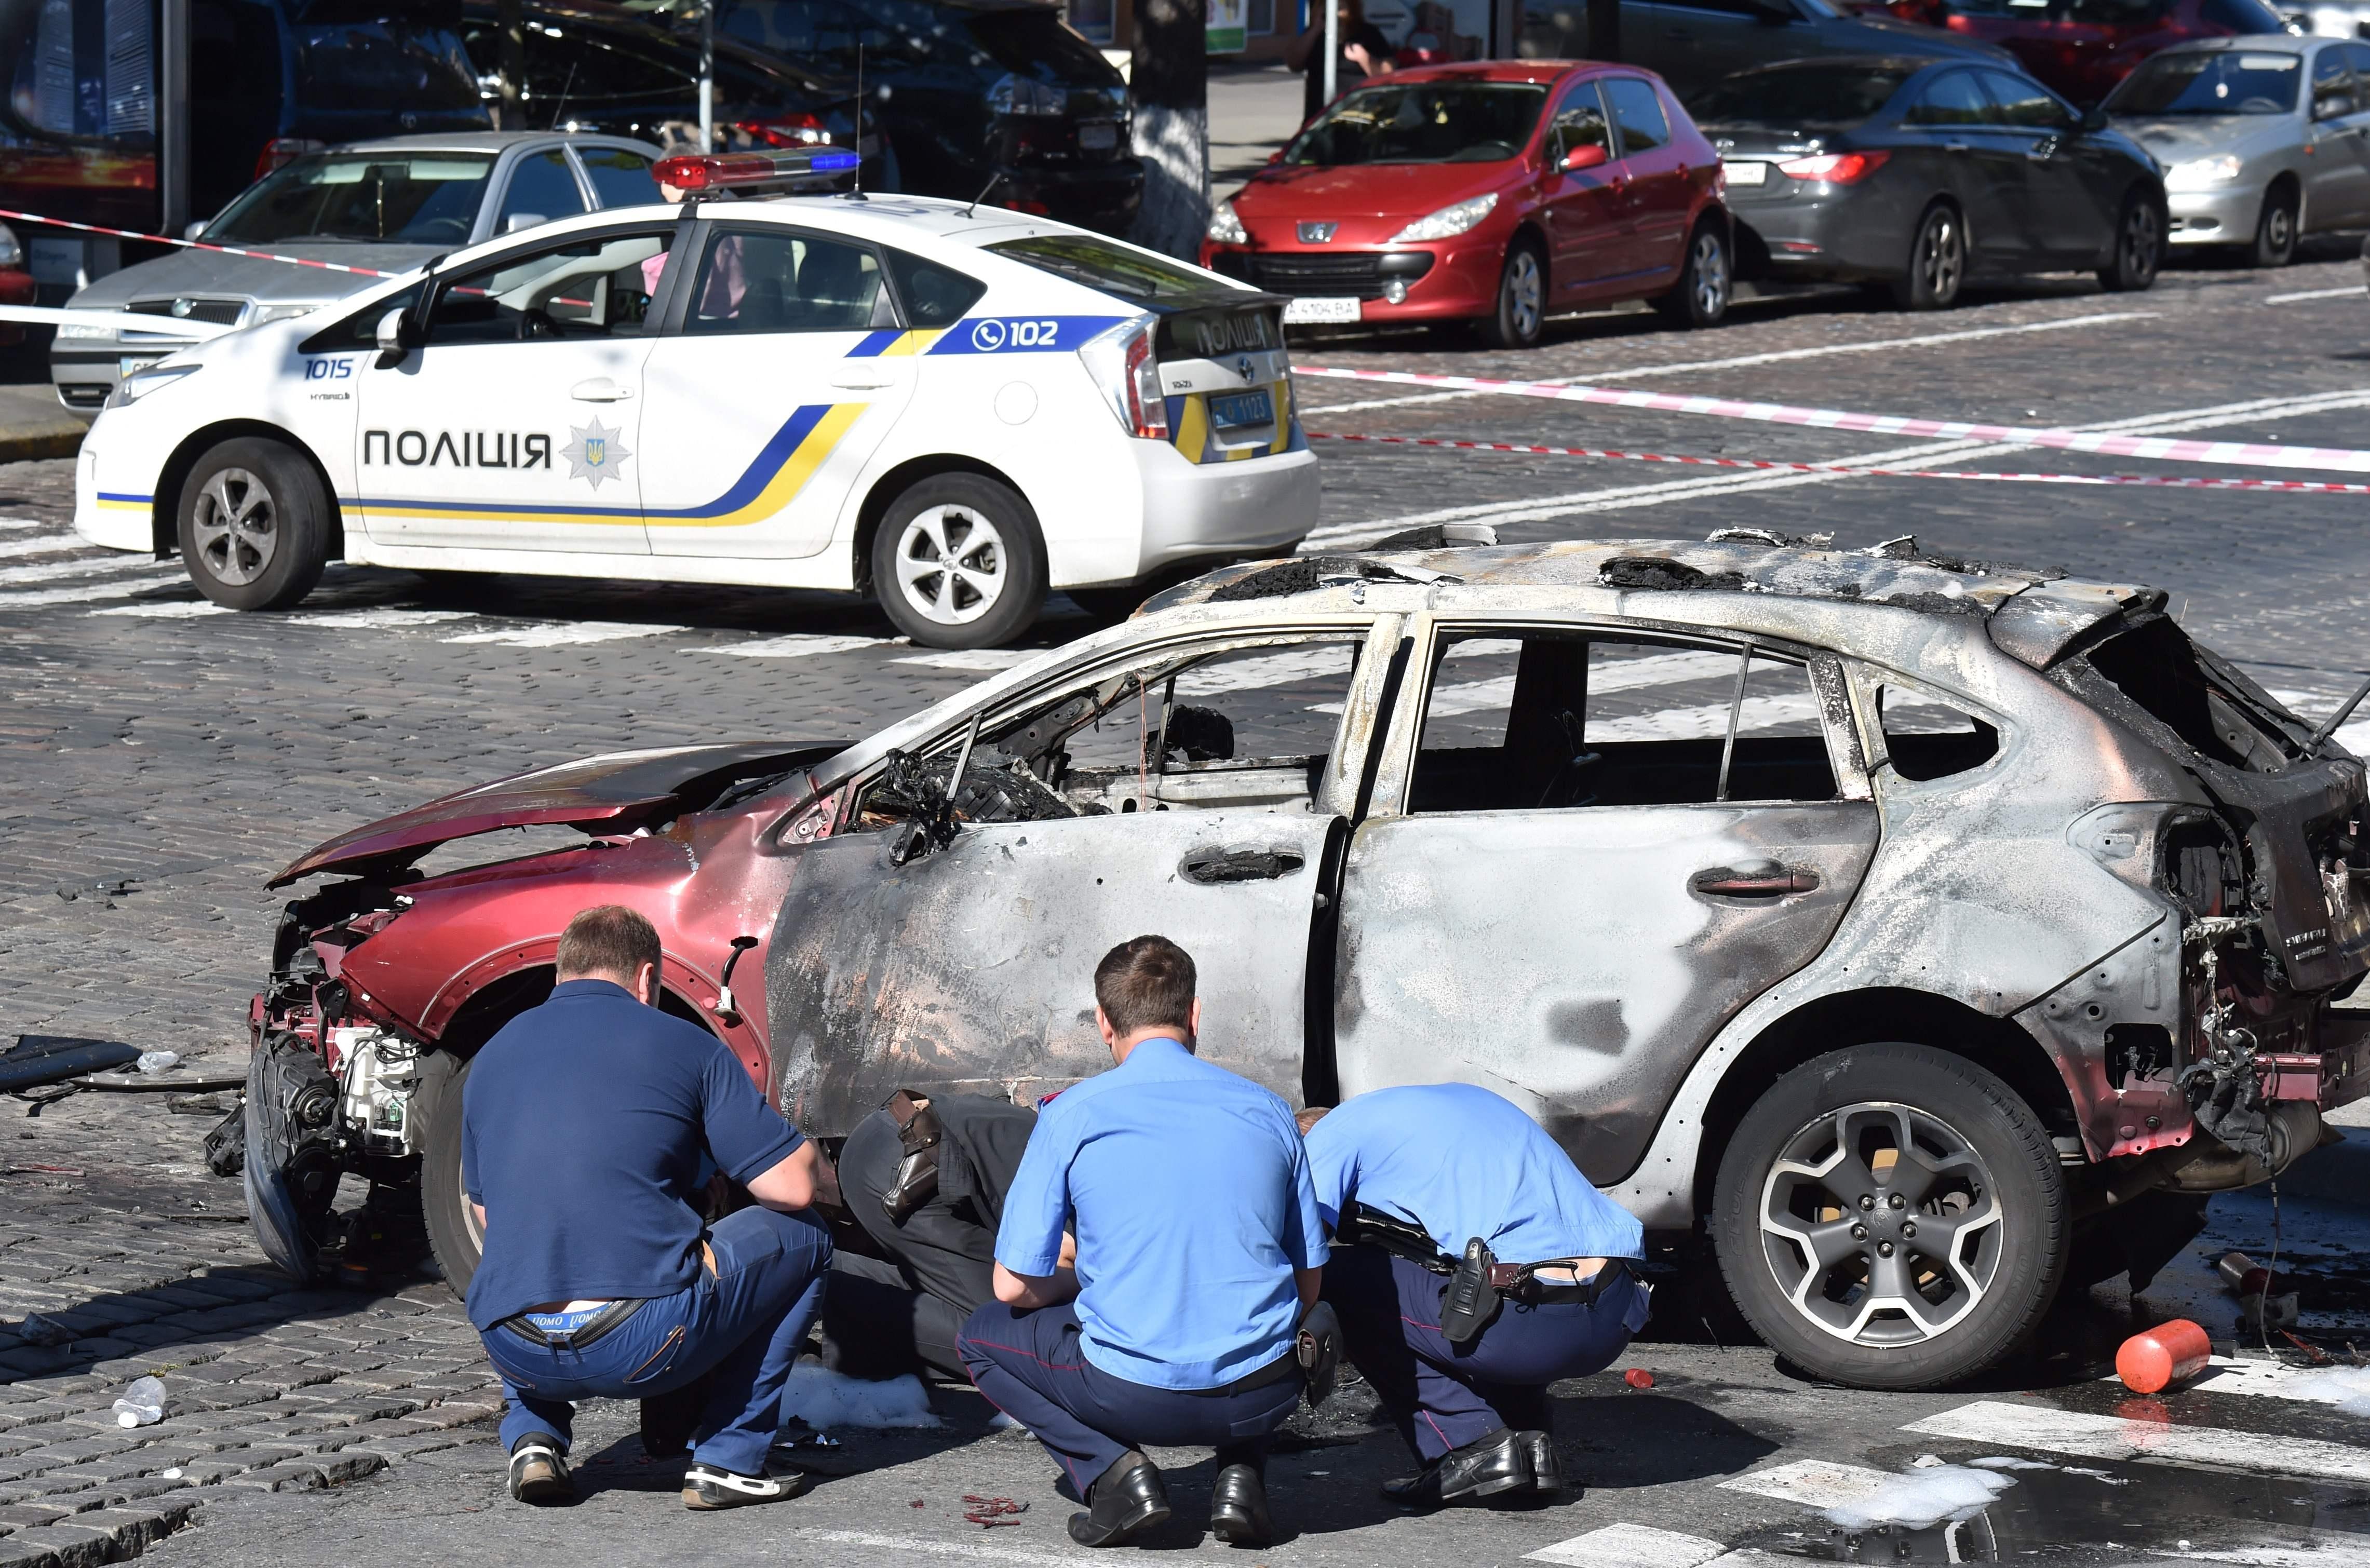 Ukraine sees ulterior motives after car bomb kills journalist Pavel Sheremet